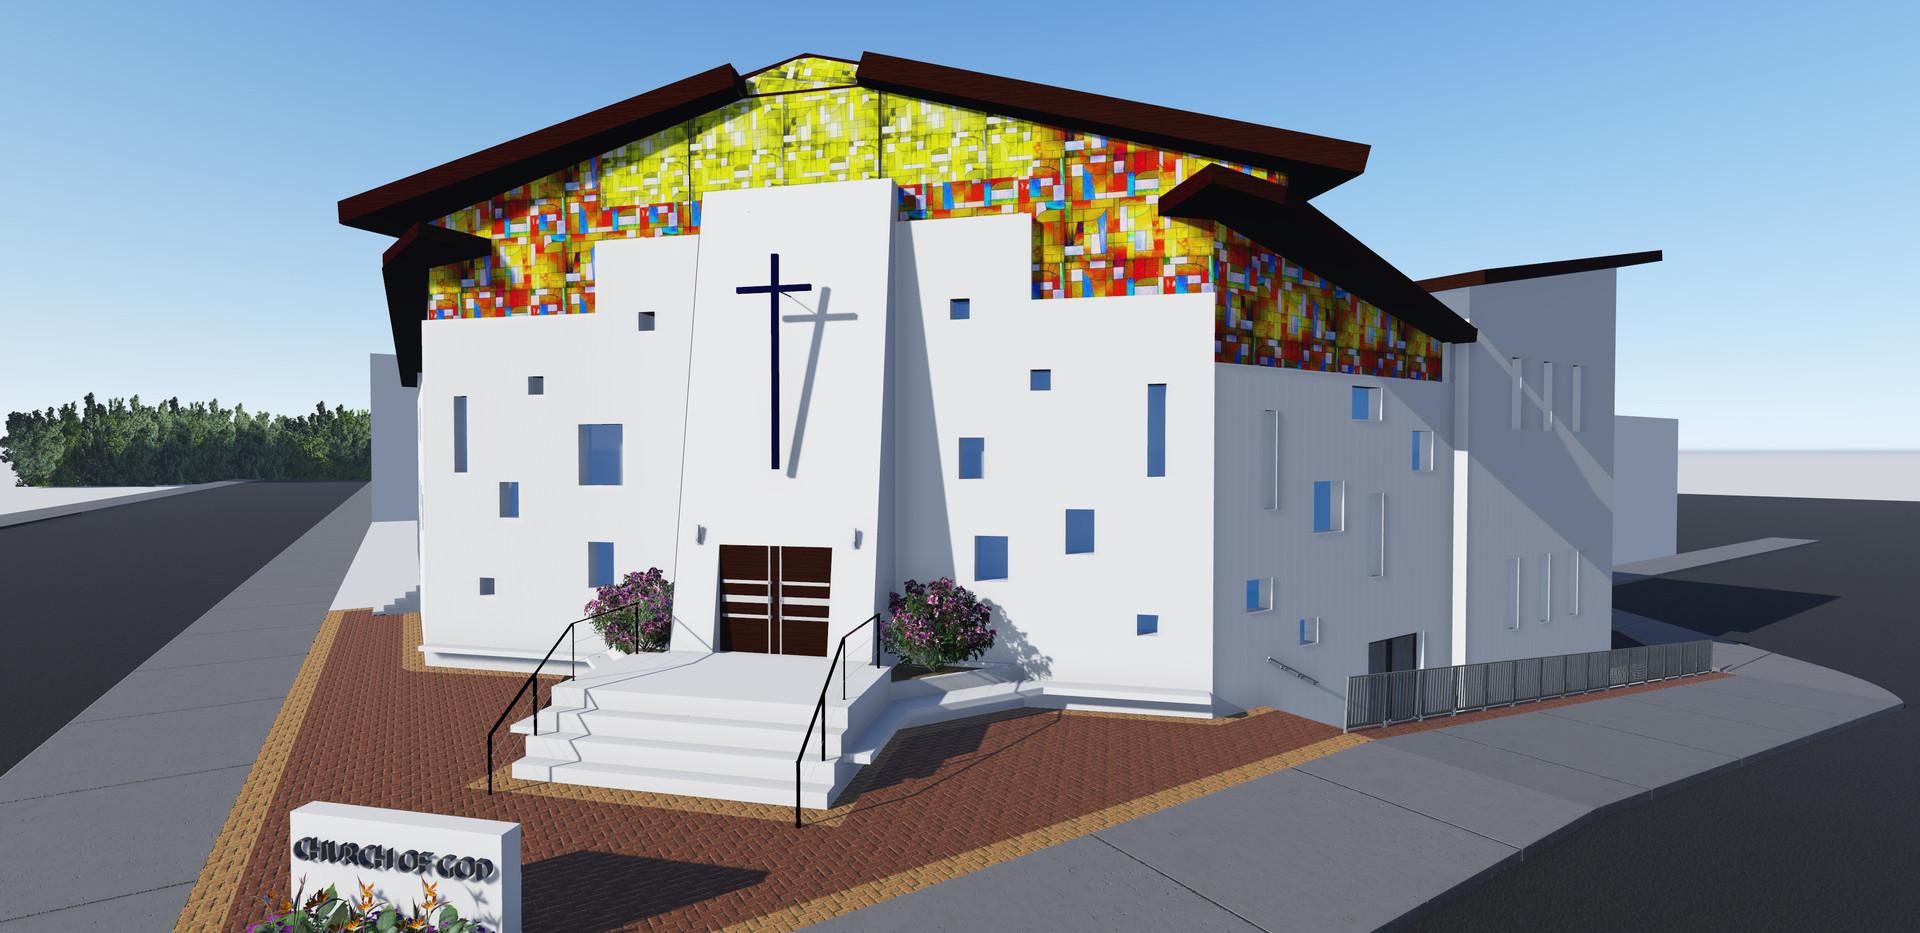 church of god 3.jpg